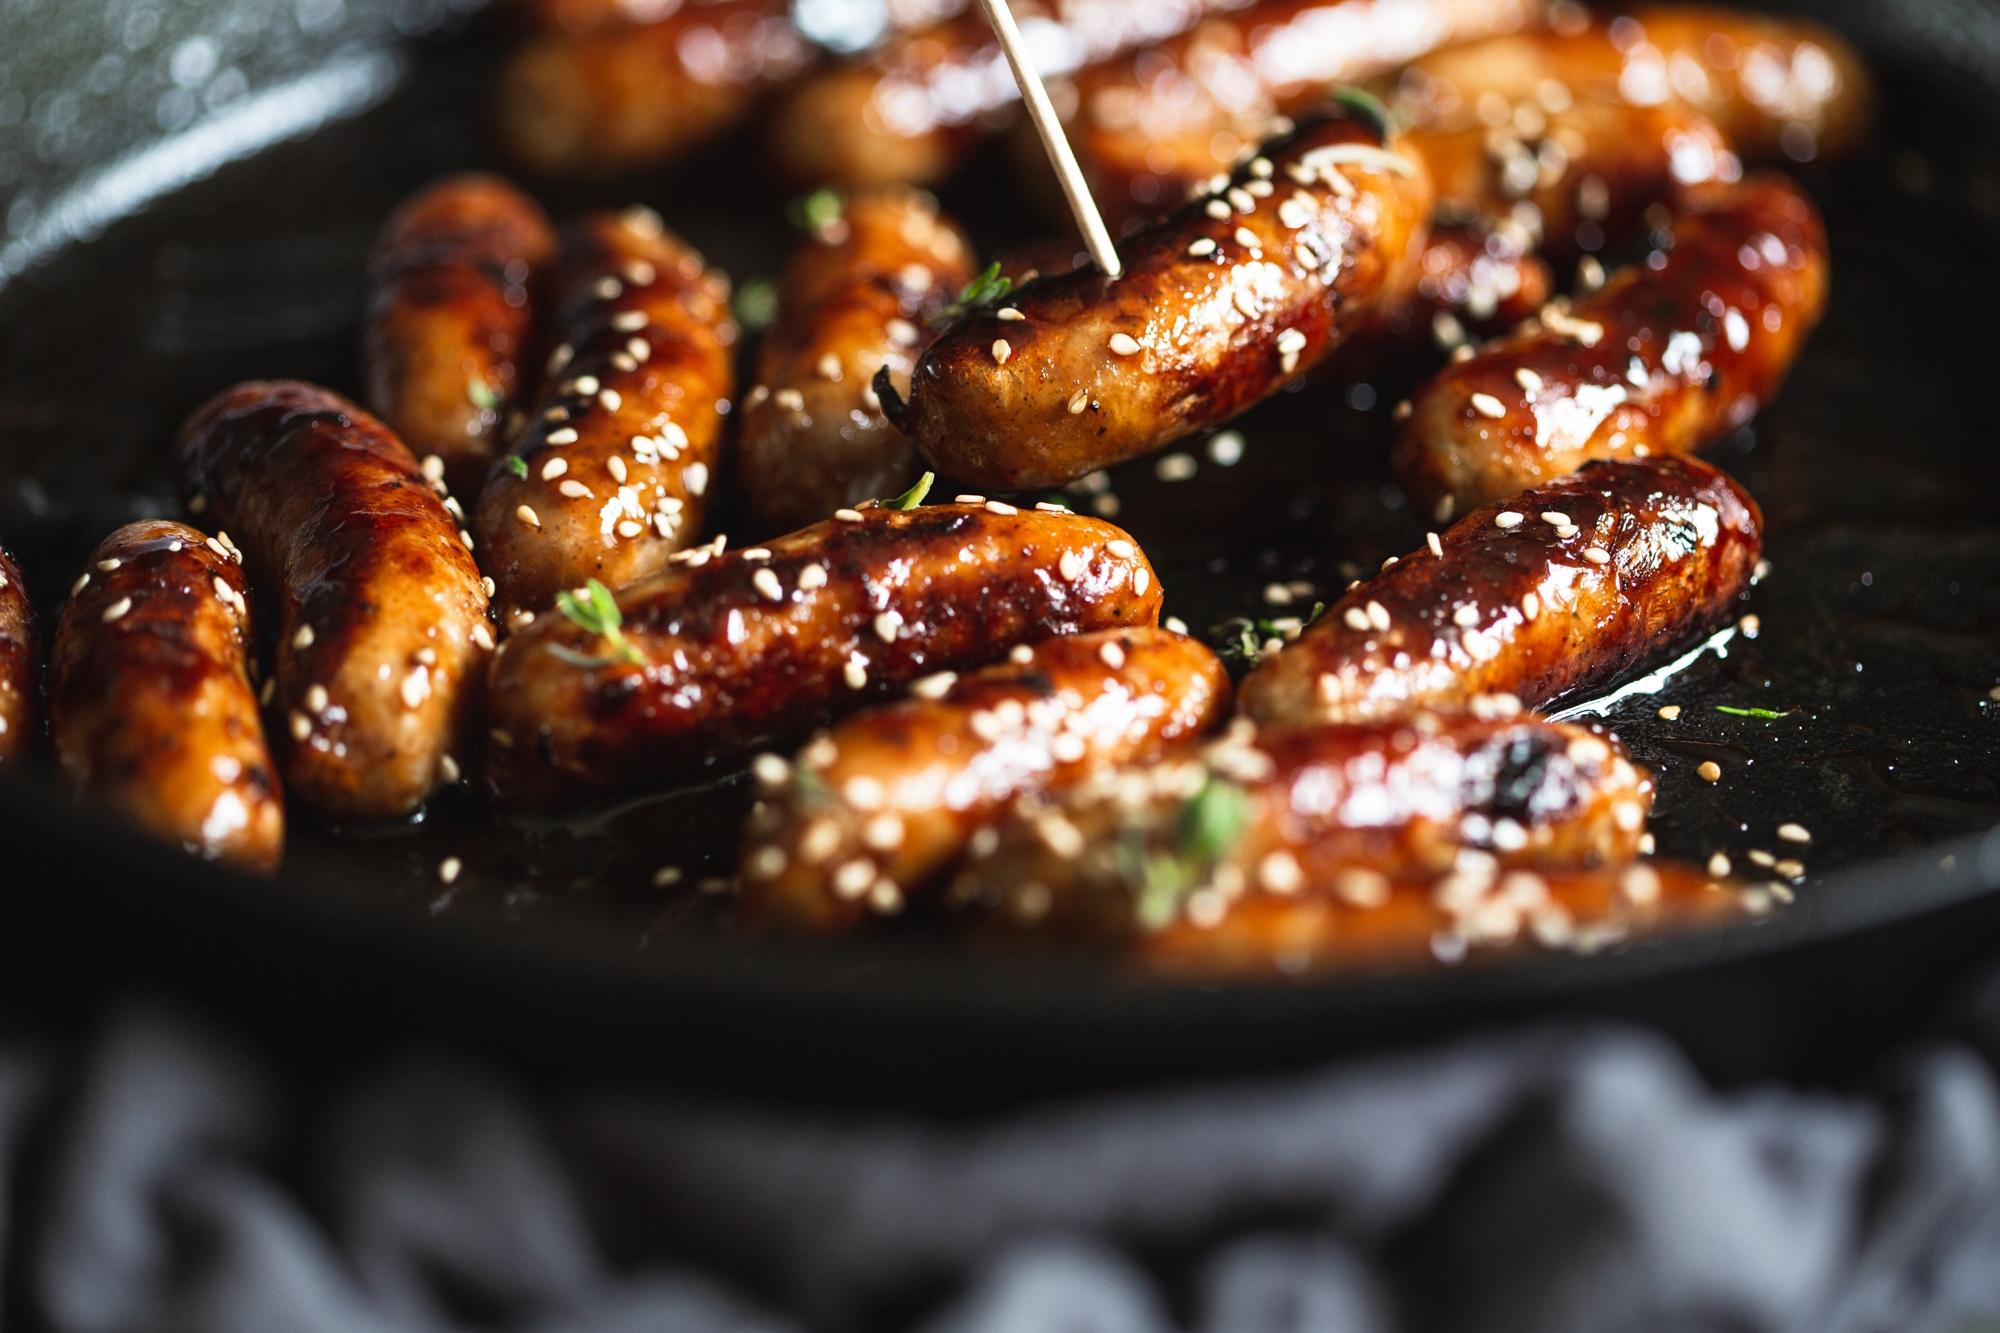 Pork cocktail sausages